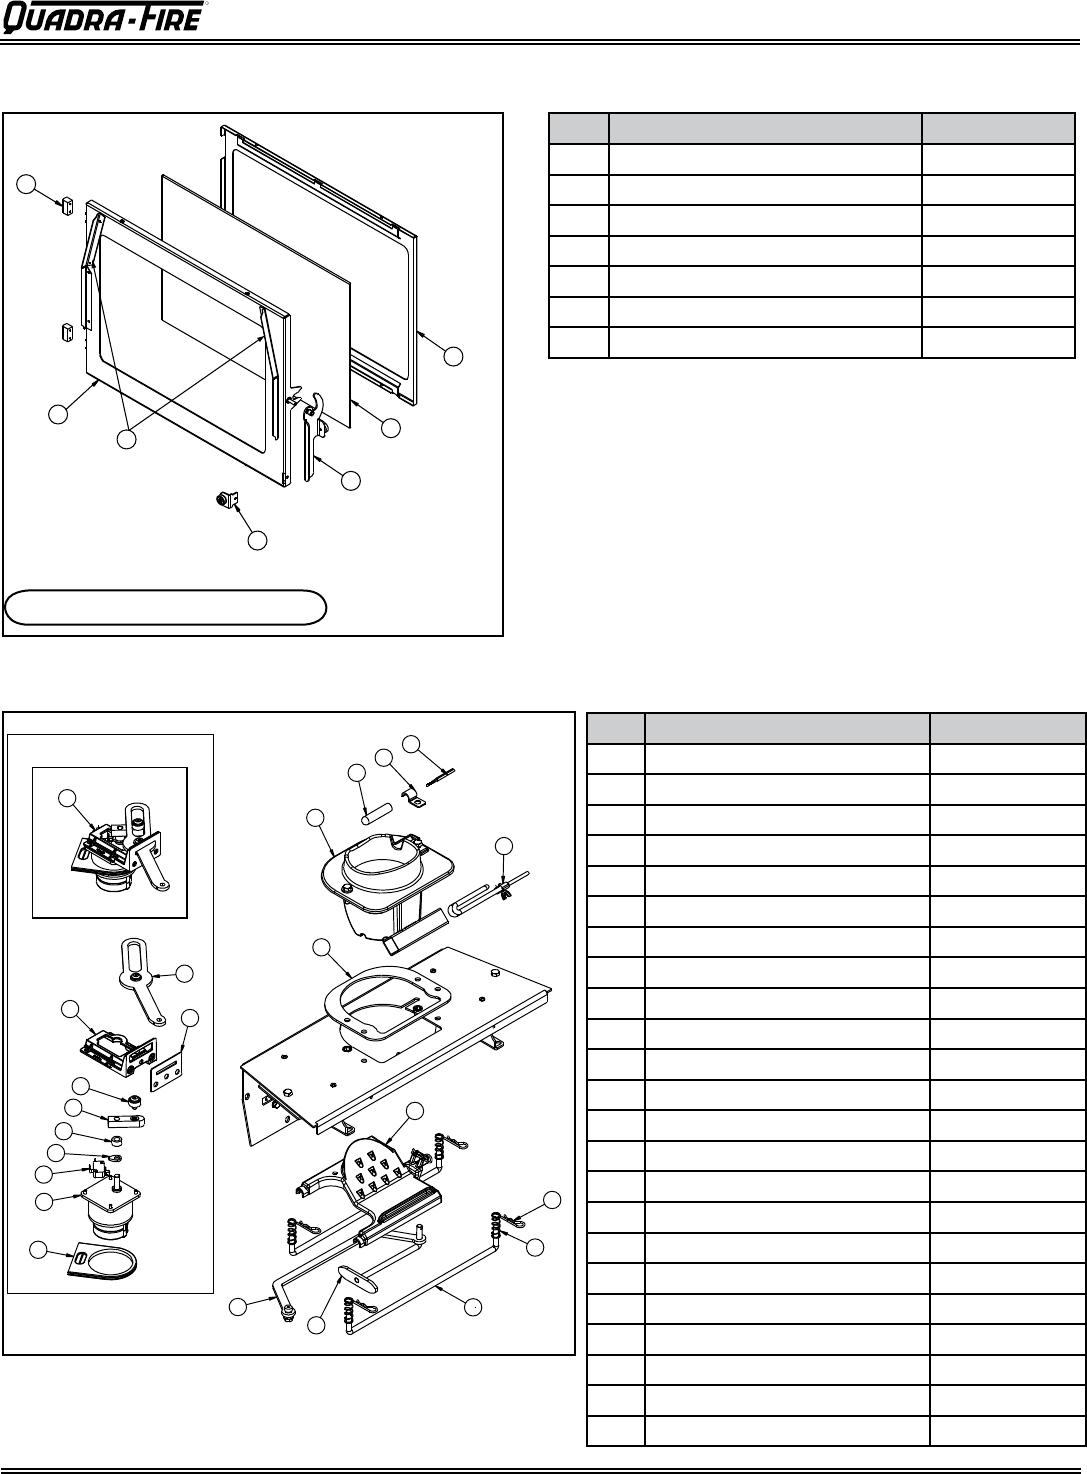 wiring 193 fire diagram quadra